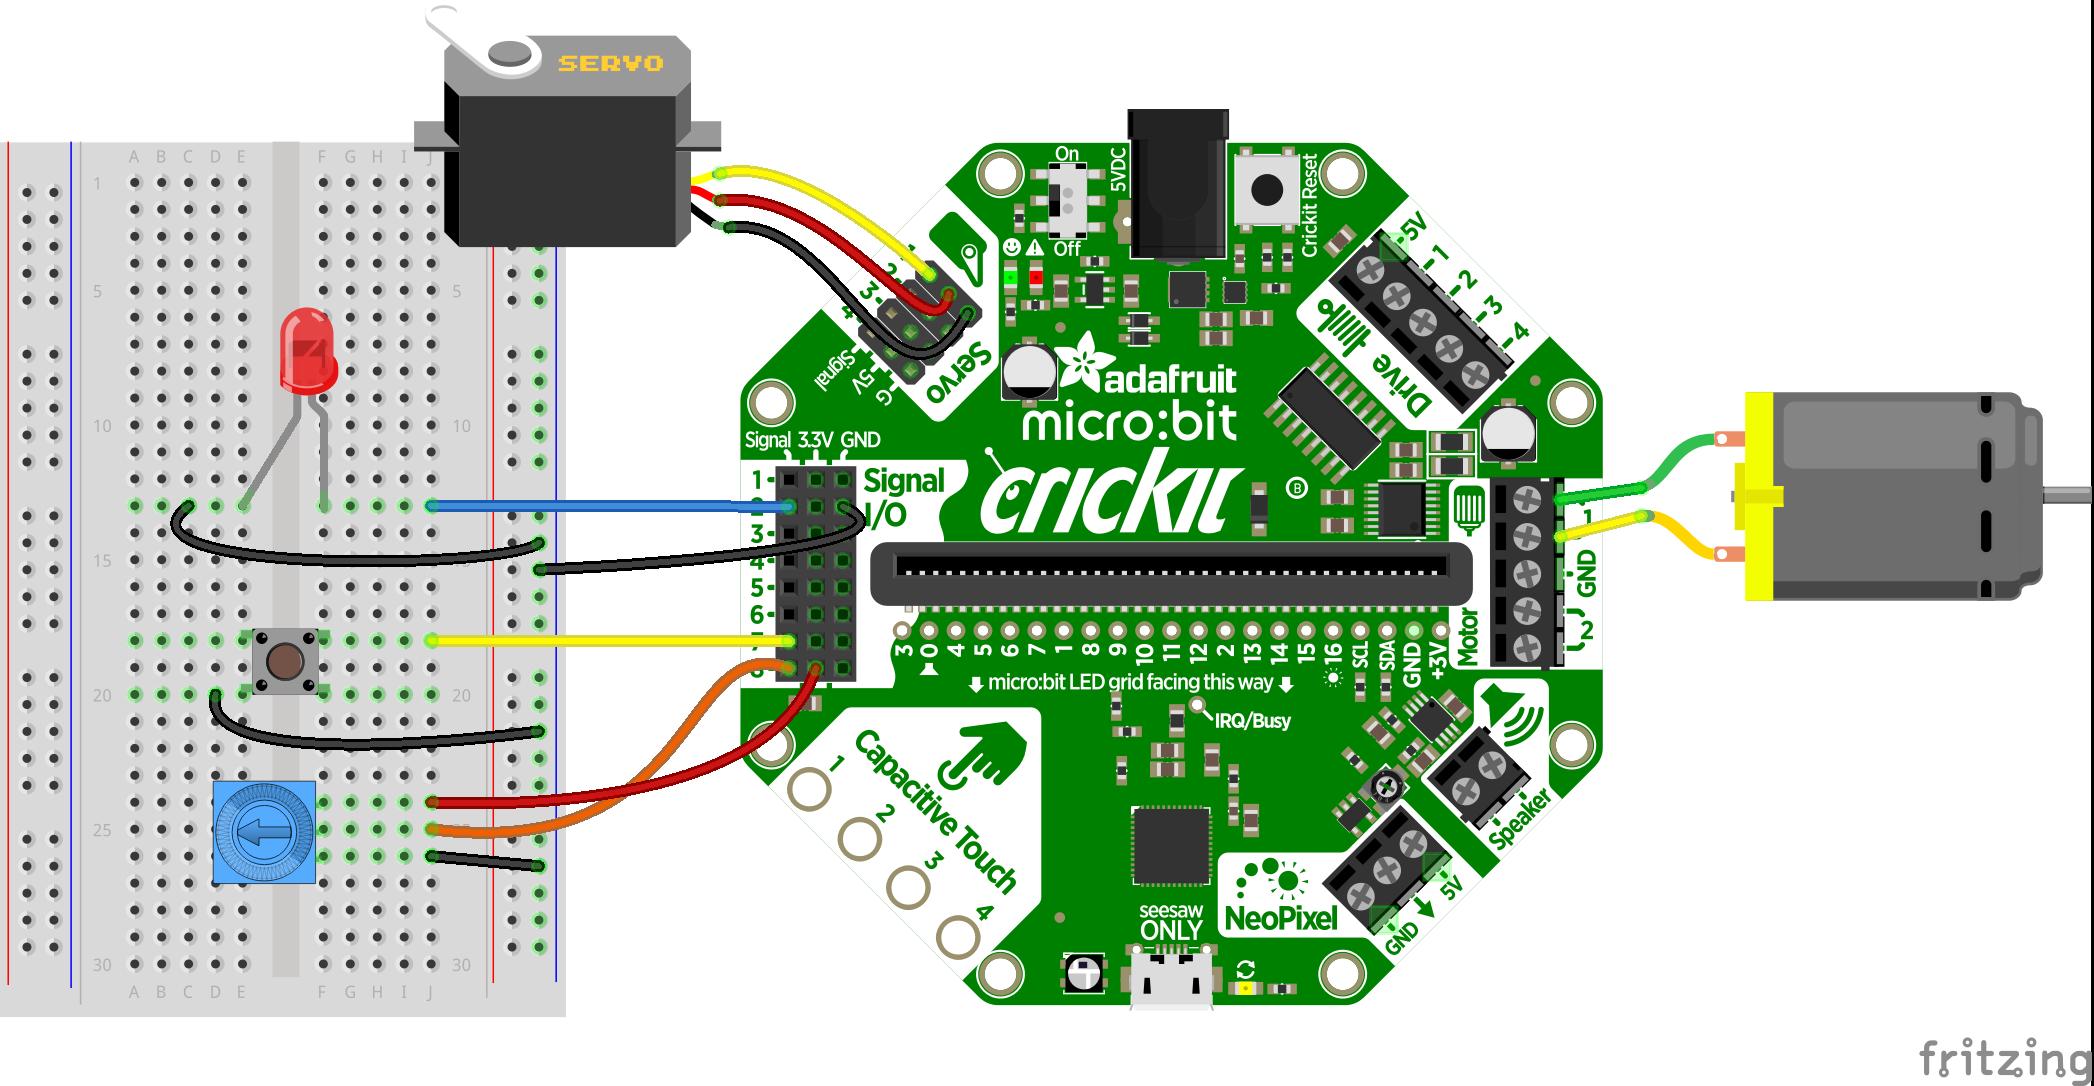 micropython_microbit_crickit_test_bb.png